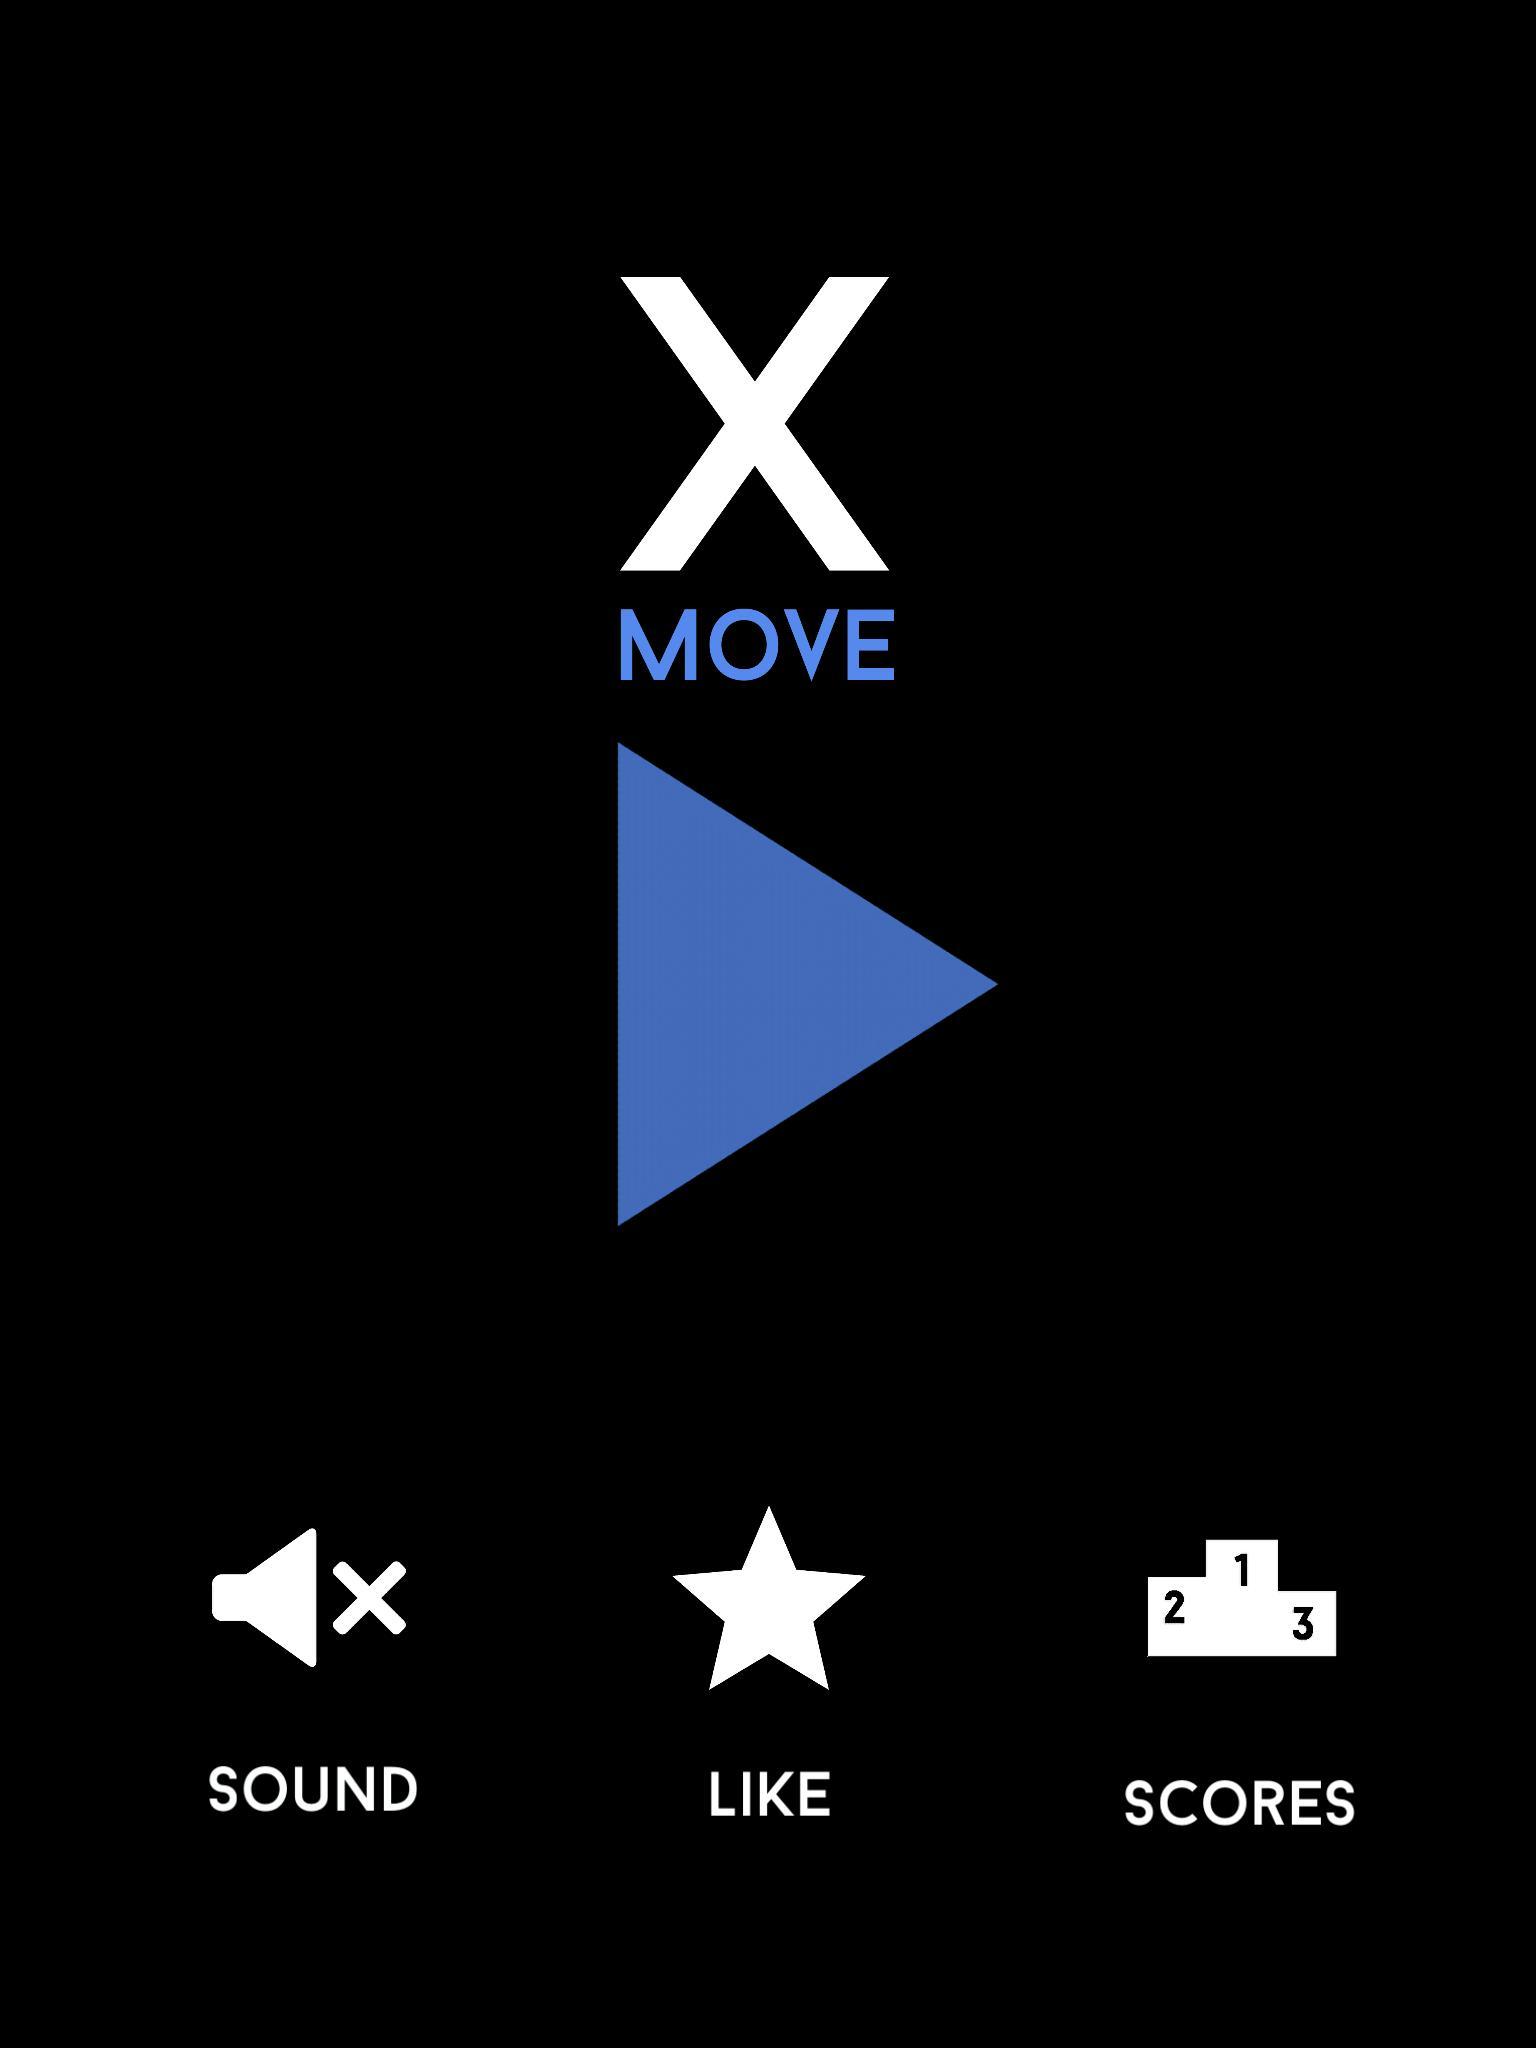 xmove download